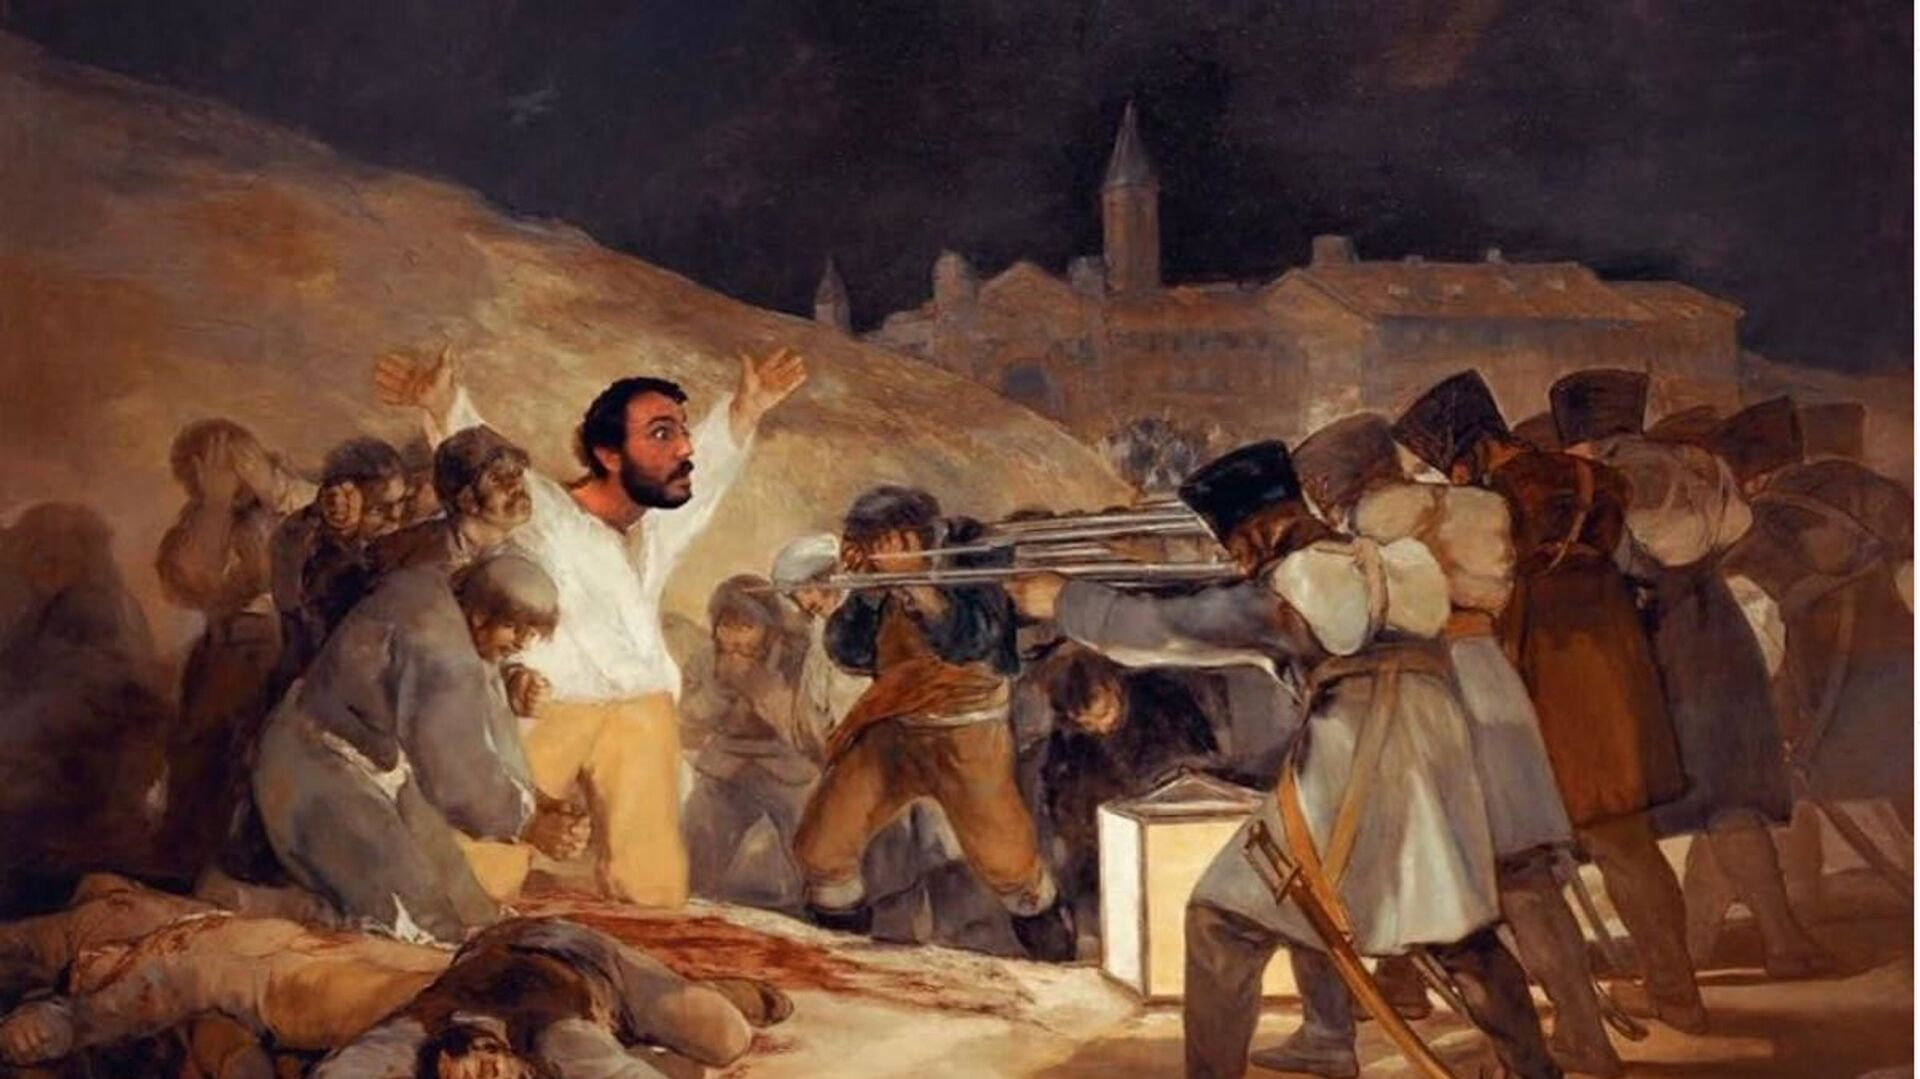 Paco Pajuelo, profesor de Historia del IES Siglo XXI de Sevilla, en el cuadro de Francisco Goya - Sputnik Mundo, 1920, 05.06.2020